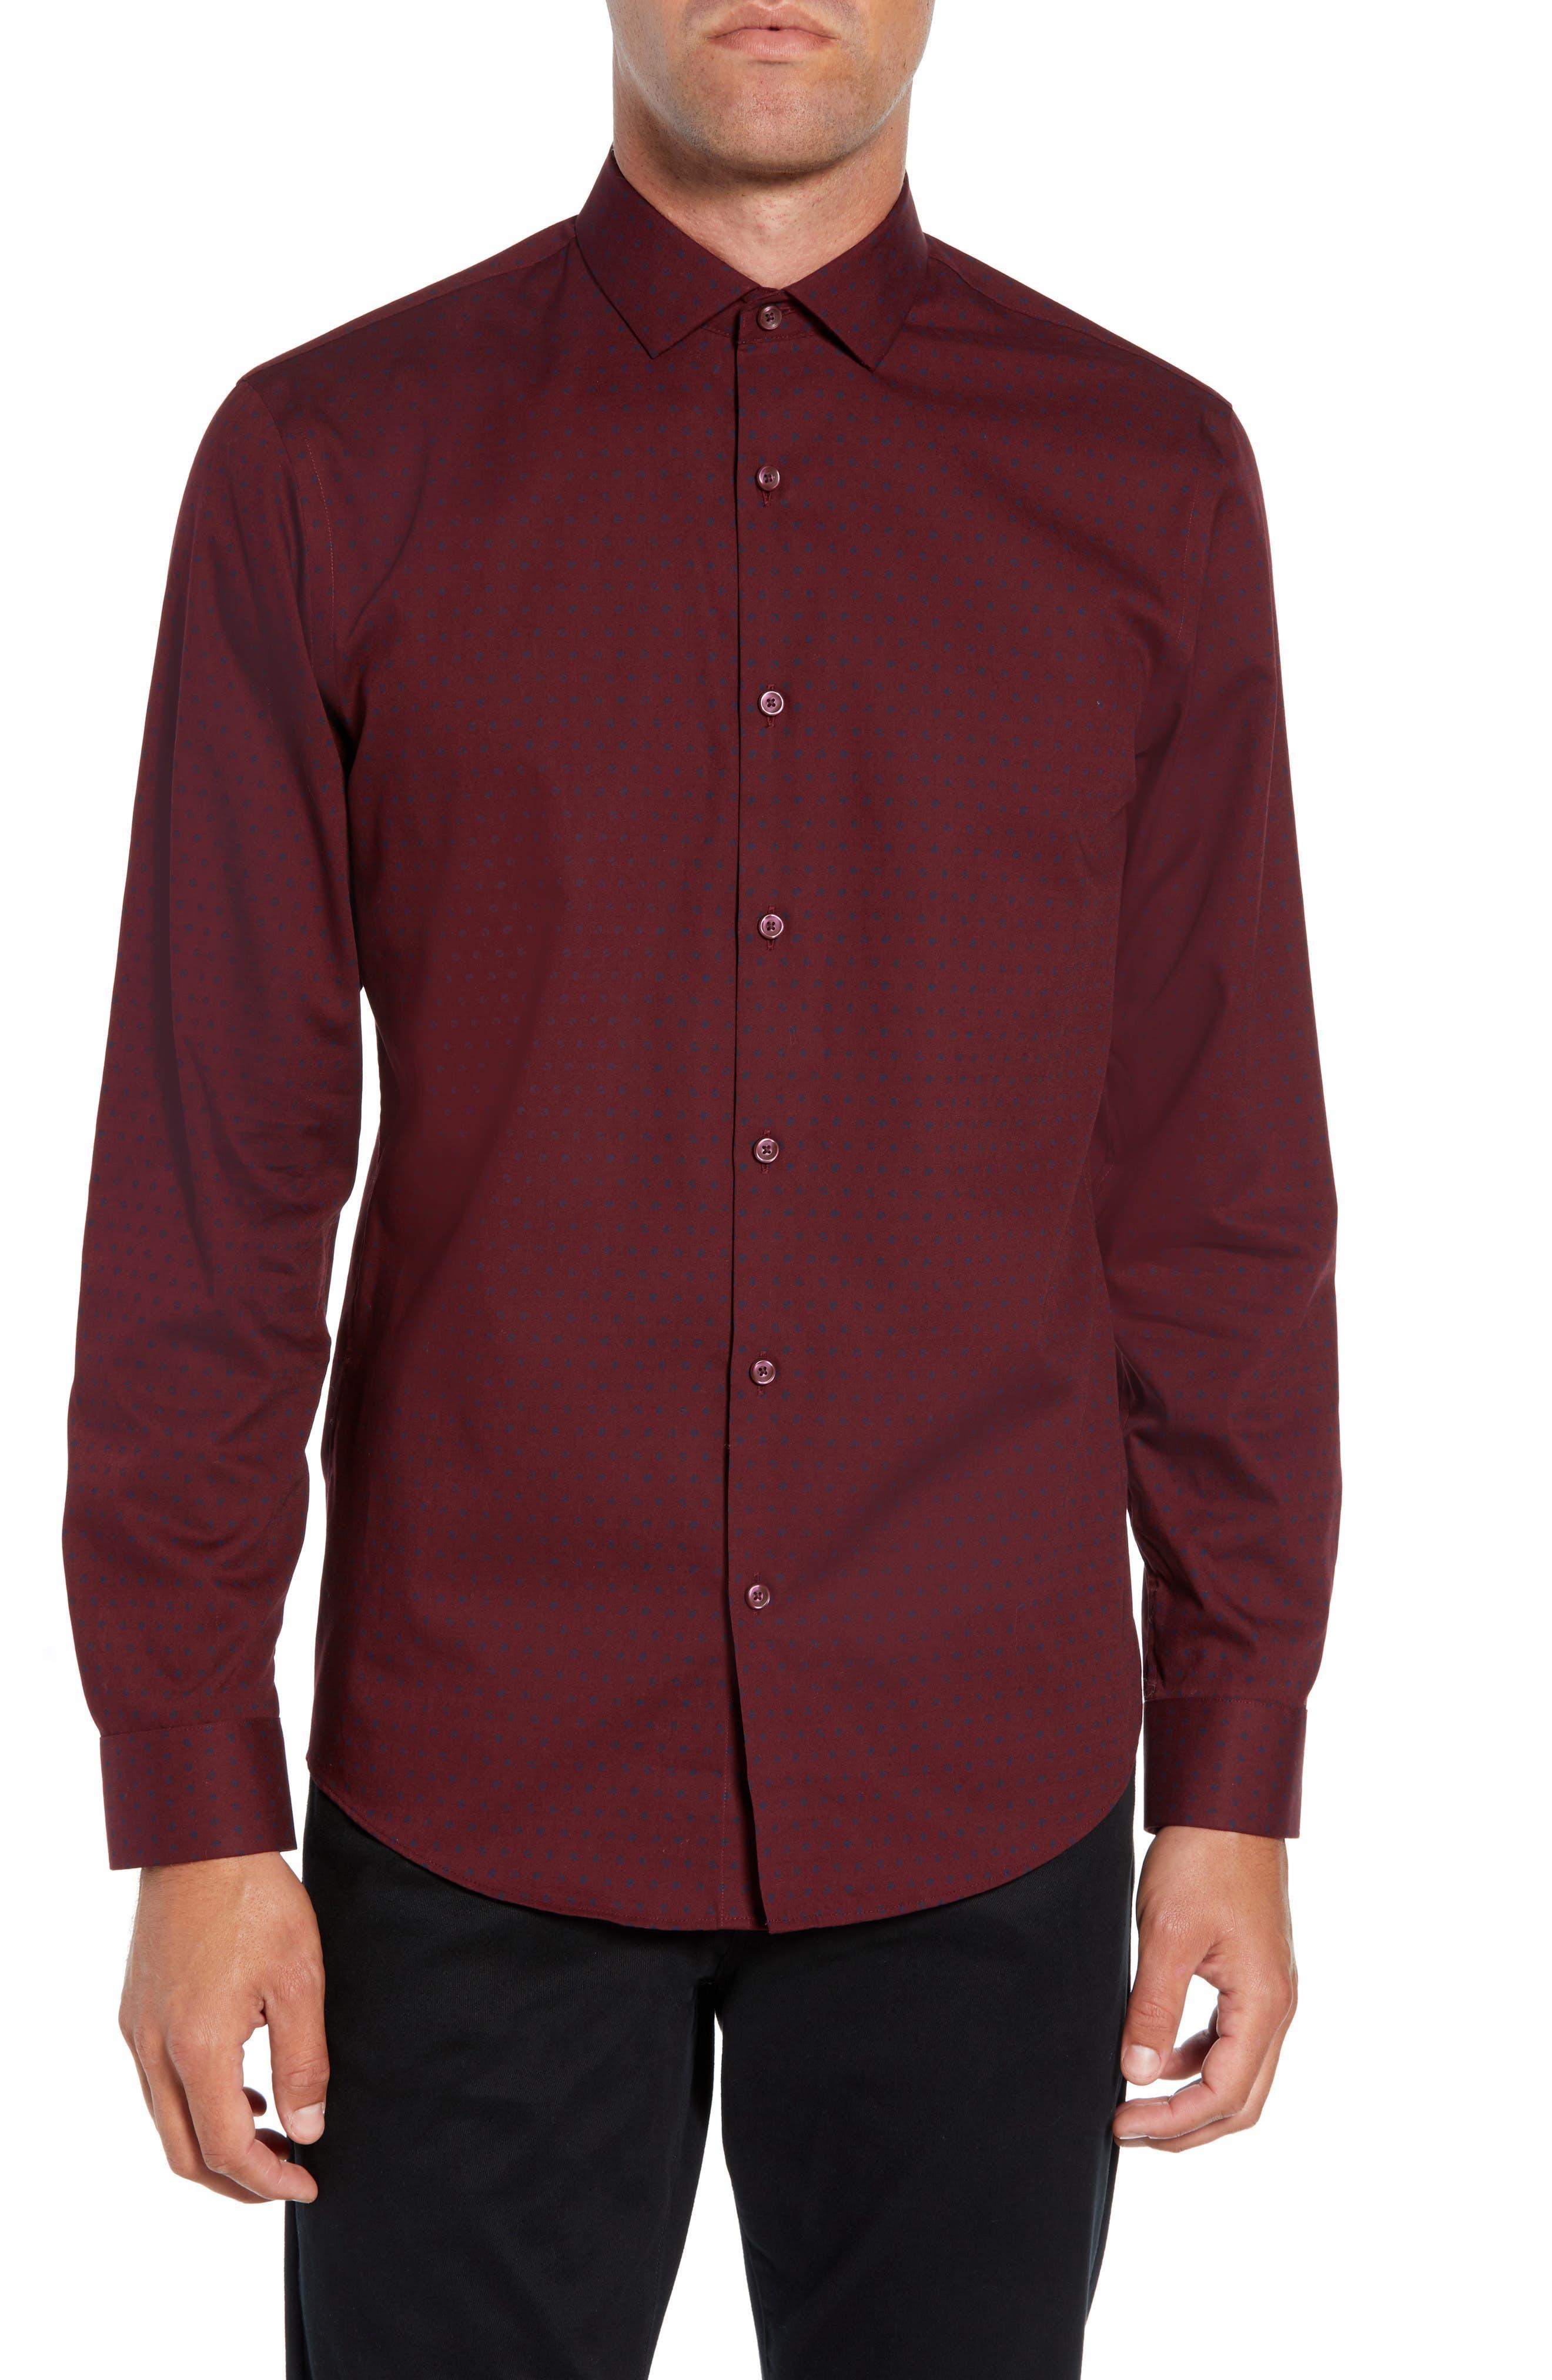 Calibrate Slim Fit Non Iron Polka Dot Sport Shirt, Burgundy